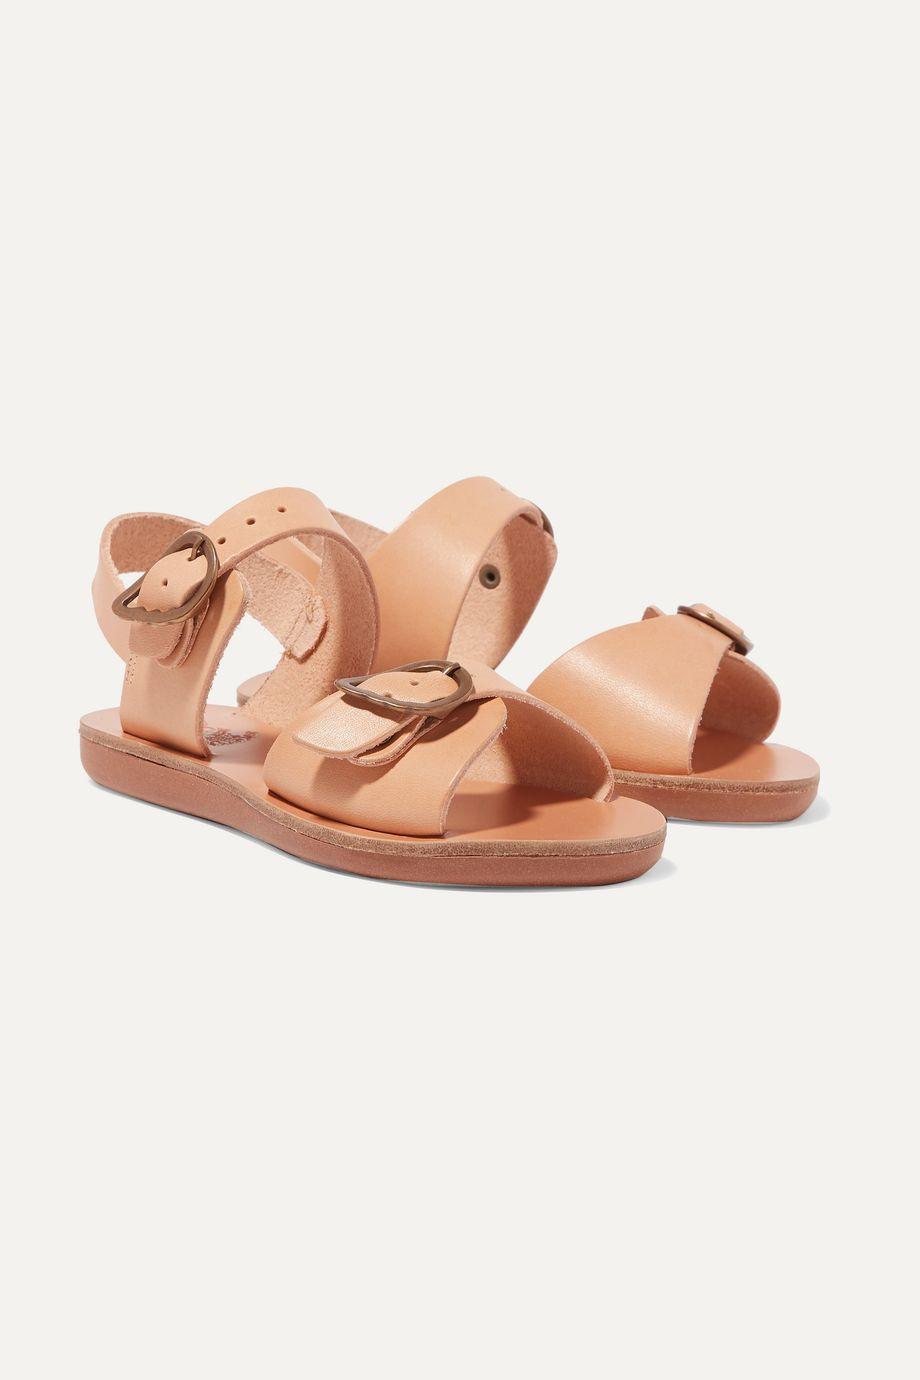 Ancient Greek Sandals Kids Size 23 - 34 Little Irini buckled leather sandals